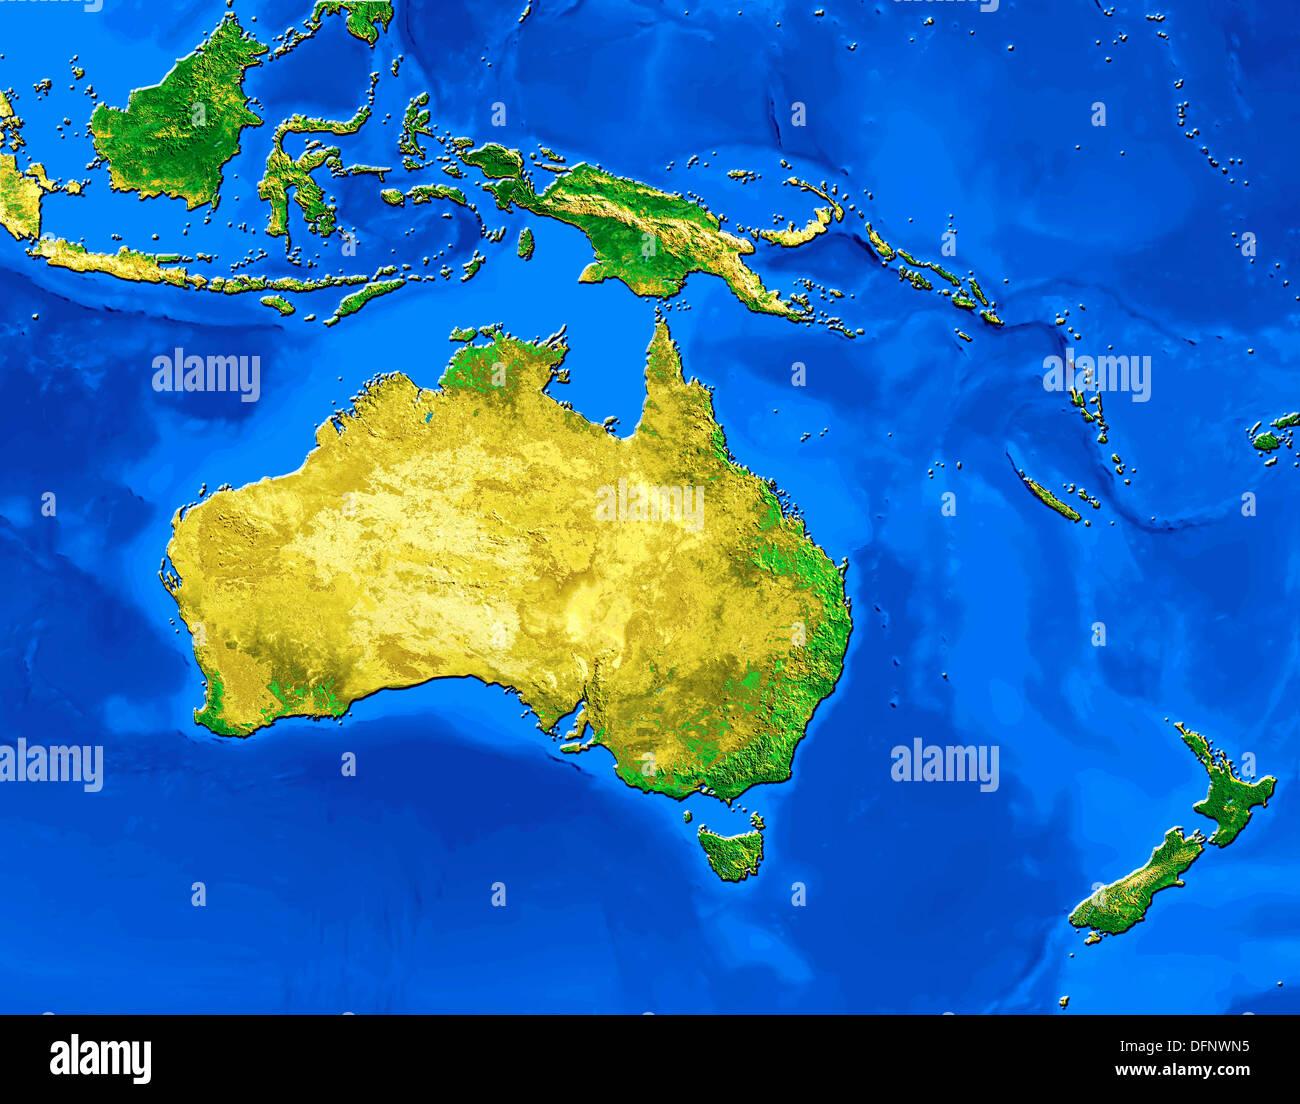 Australia And New Zealand Map Stockfotos & Australia And New ...